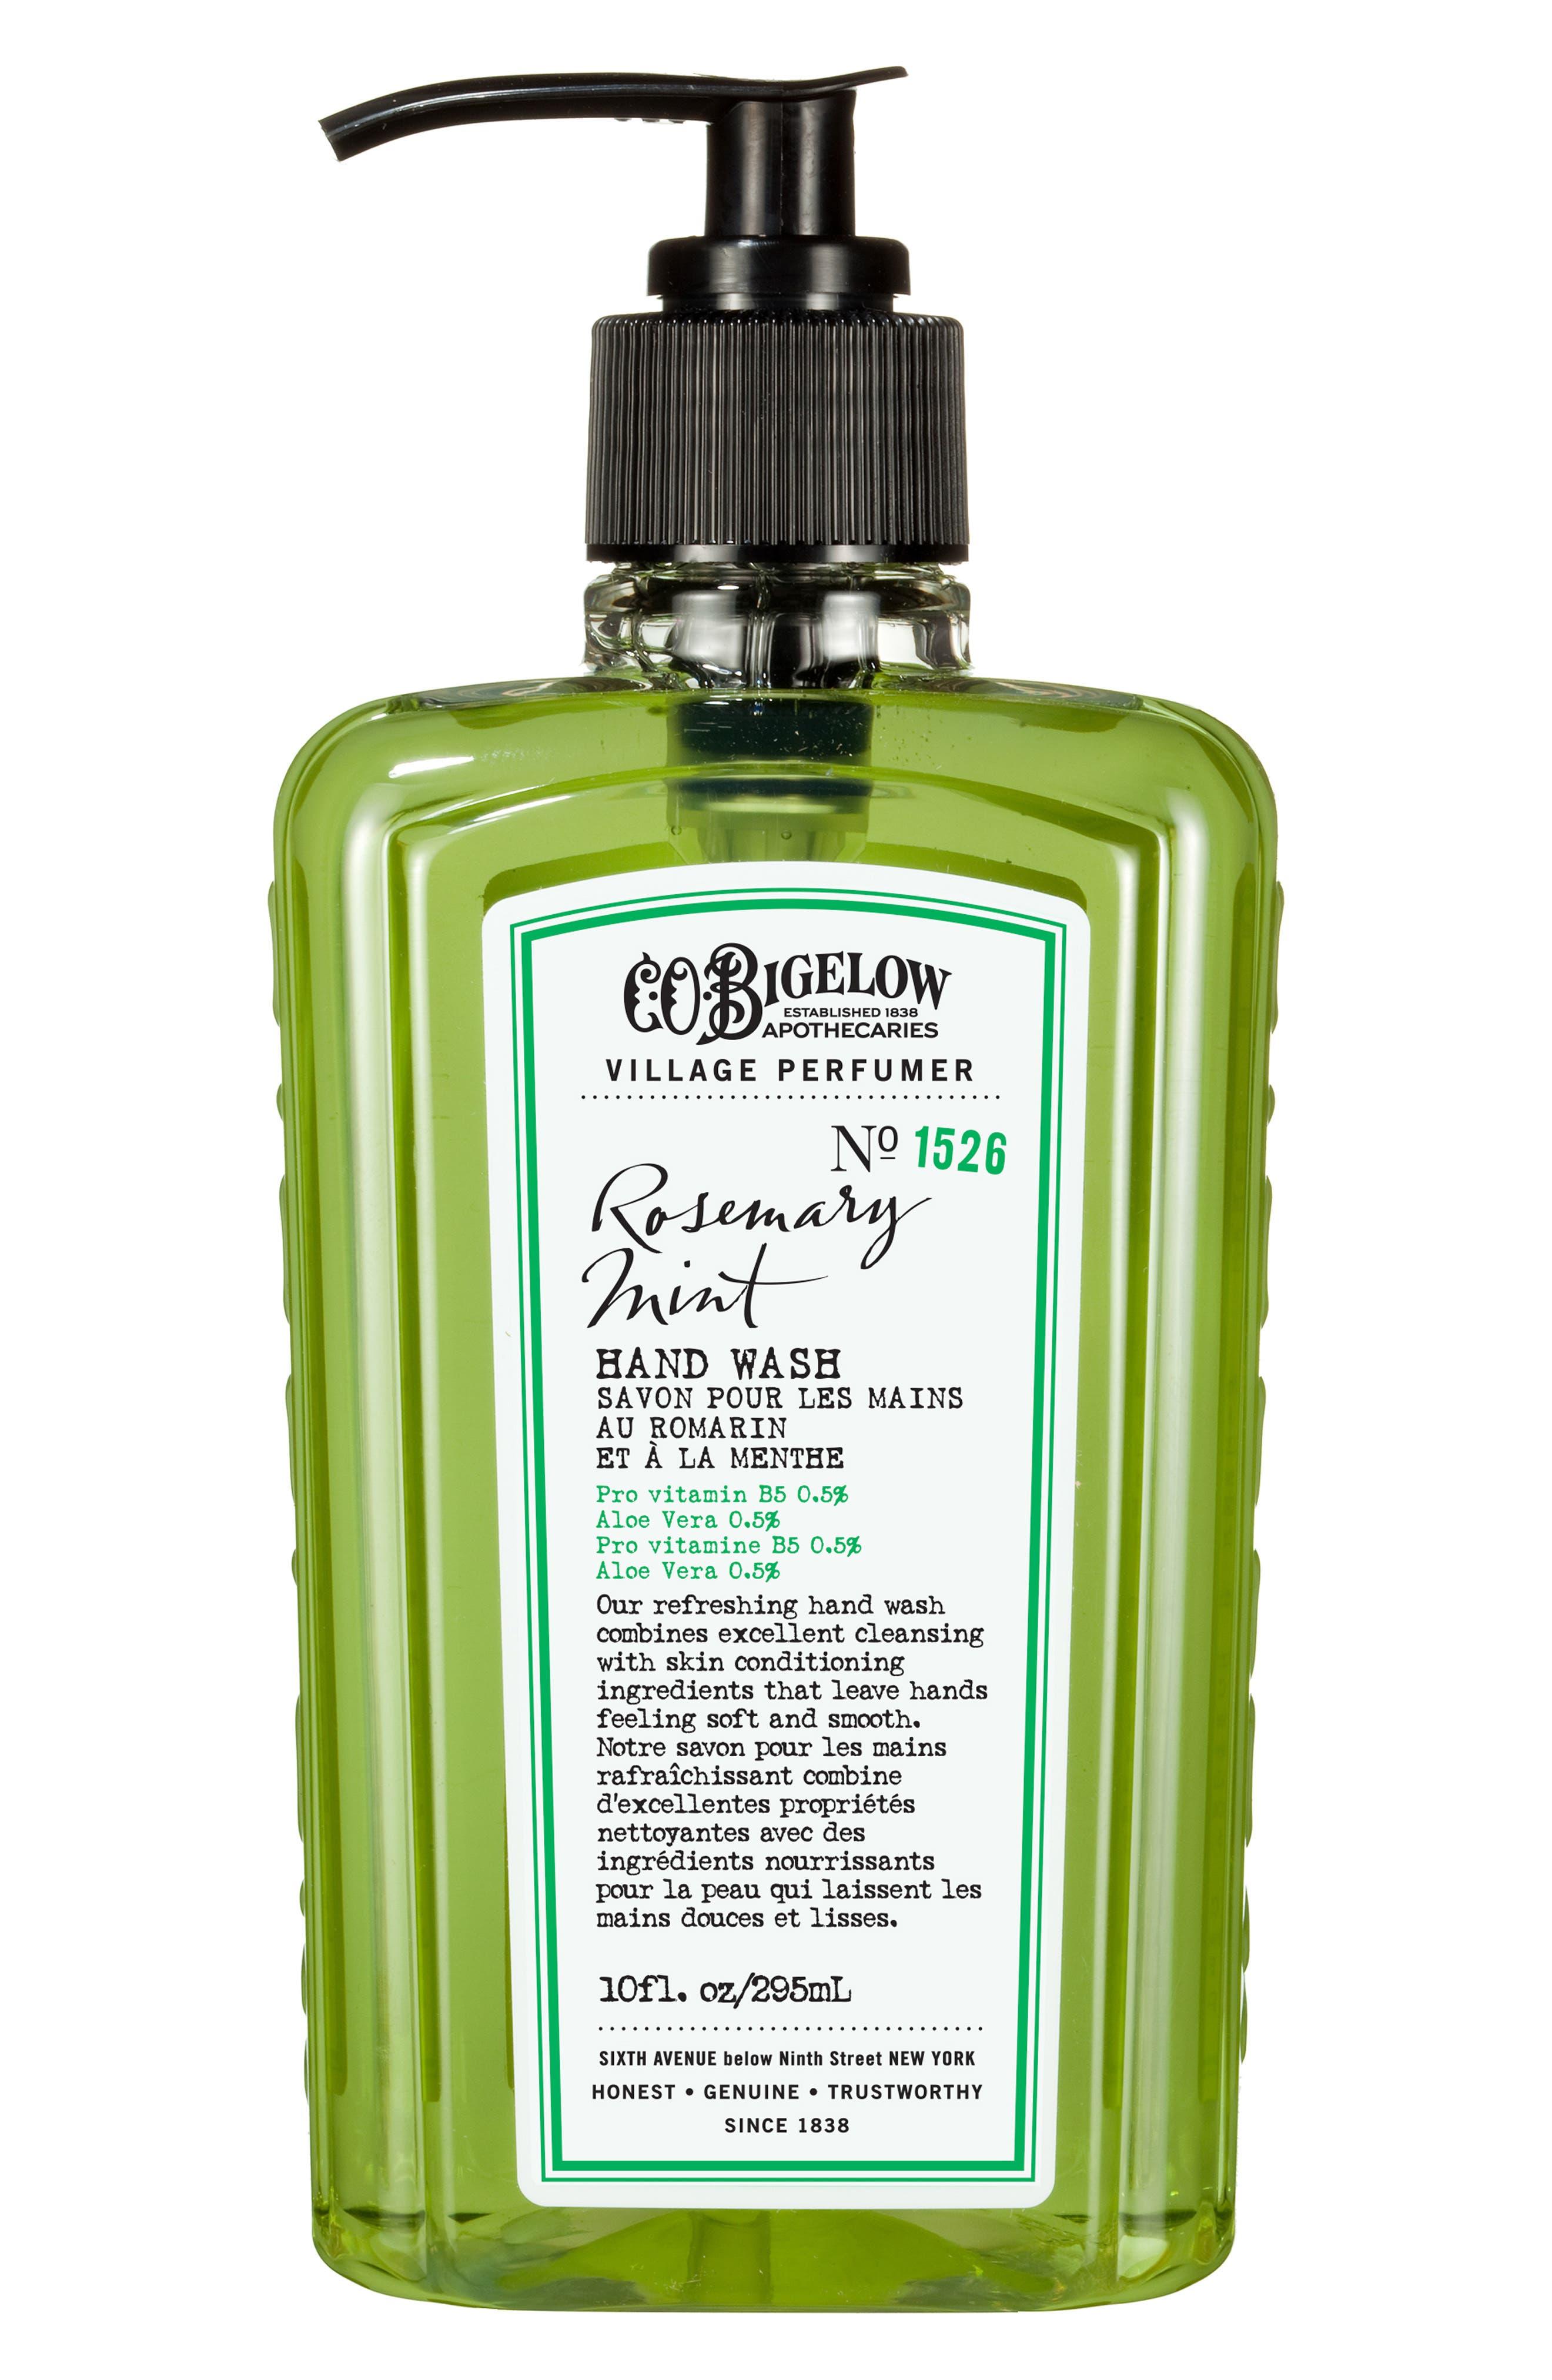 C.O. Bigelow Rosemary Mint Hand Wash